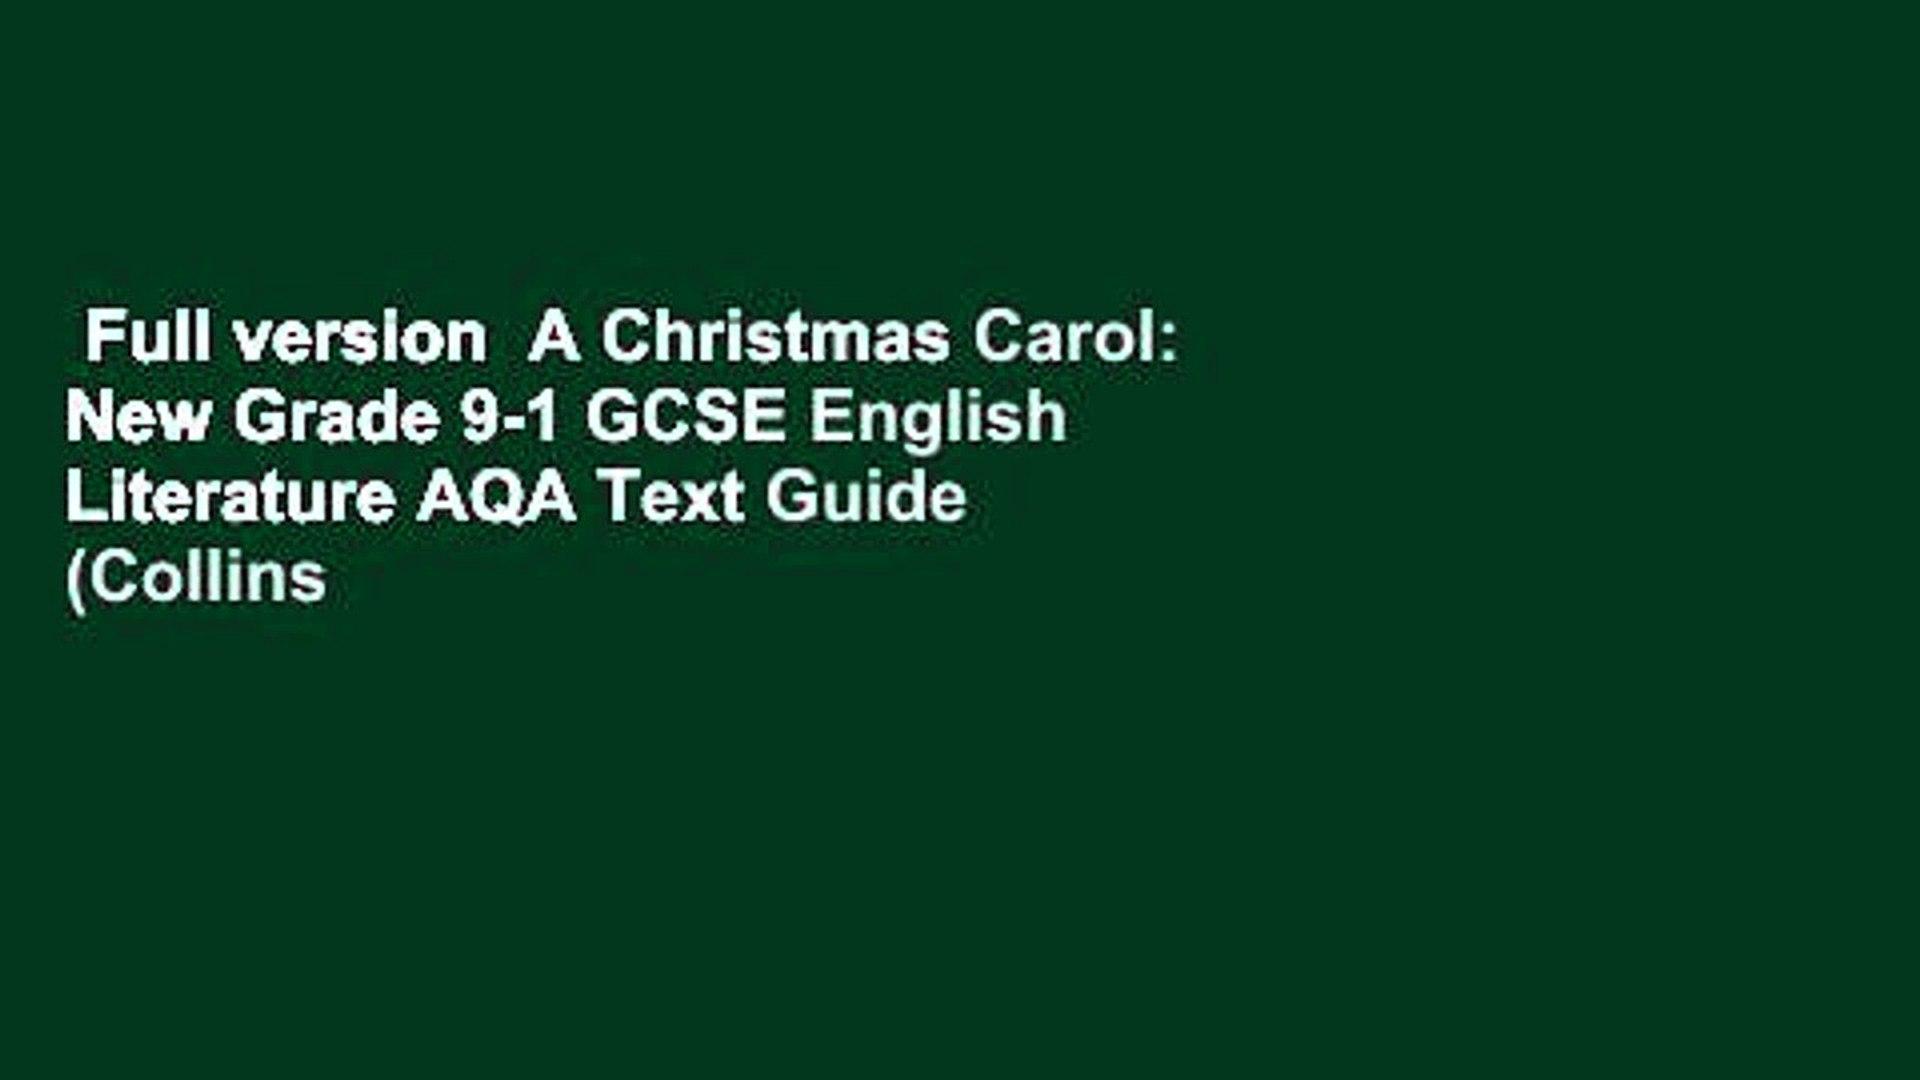 Christmas Carol Text Guide.Full Version A Christmas Carol New Grade 9 1 Gcse English Literature Aqa Text Guide Collins